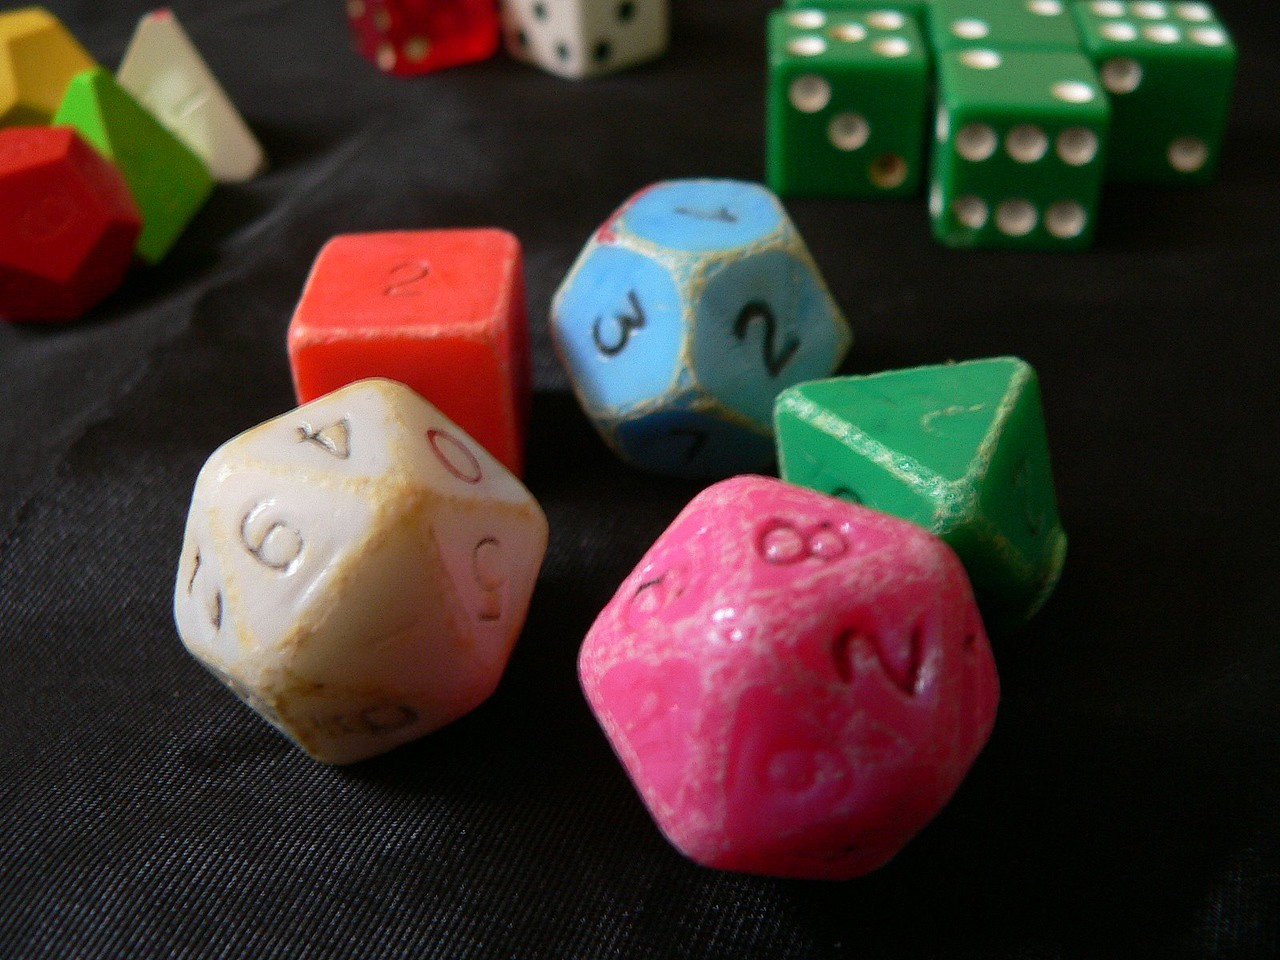 The well worn original dice set.